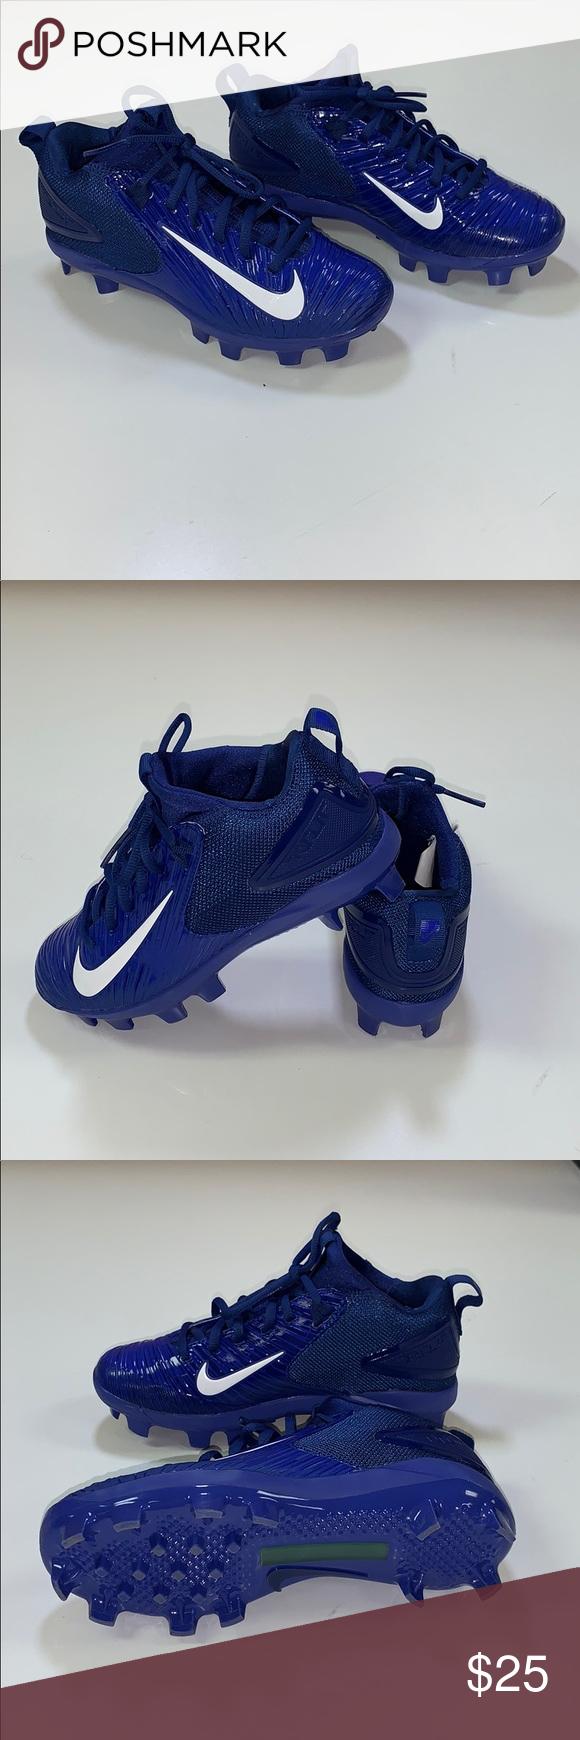 blue nike youth baseball cleats